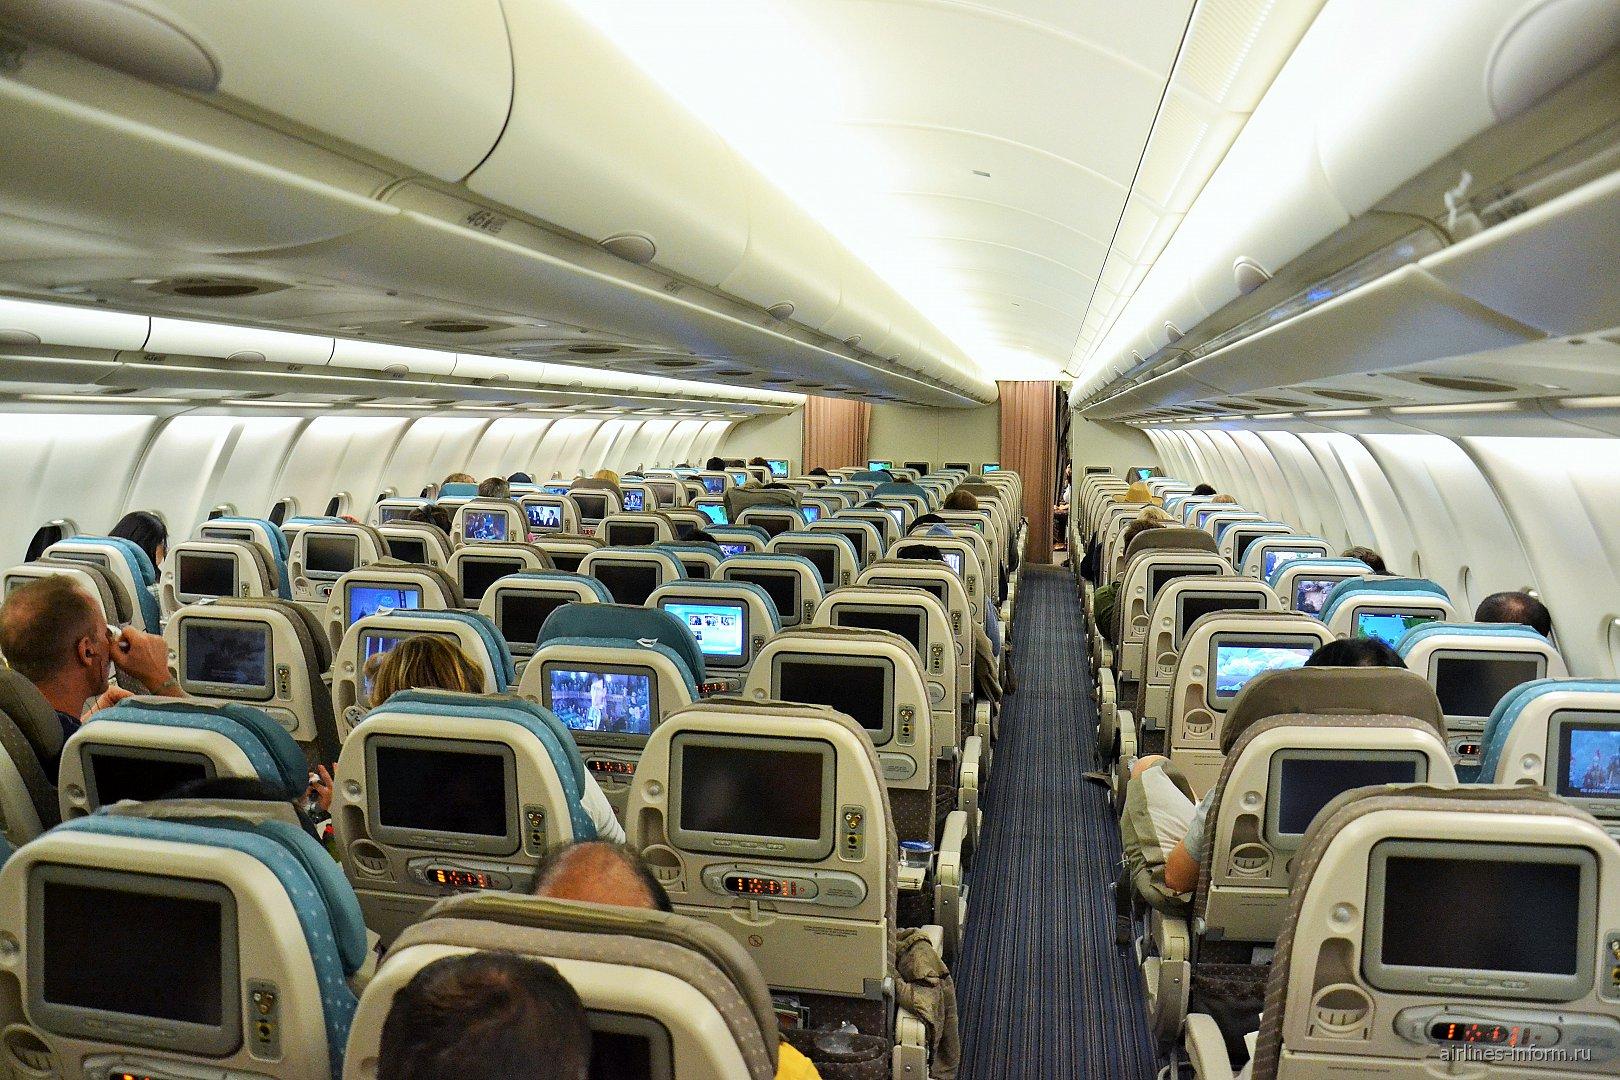 Салон эконом-класса самолета Airbus A330-300 Сингапурских авиалиний